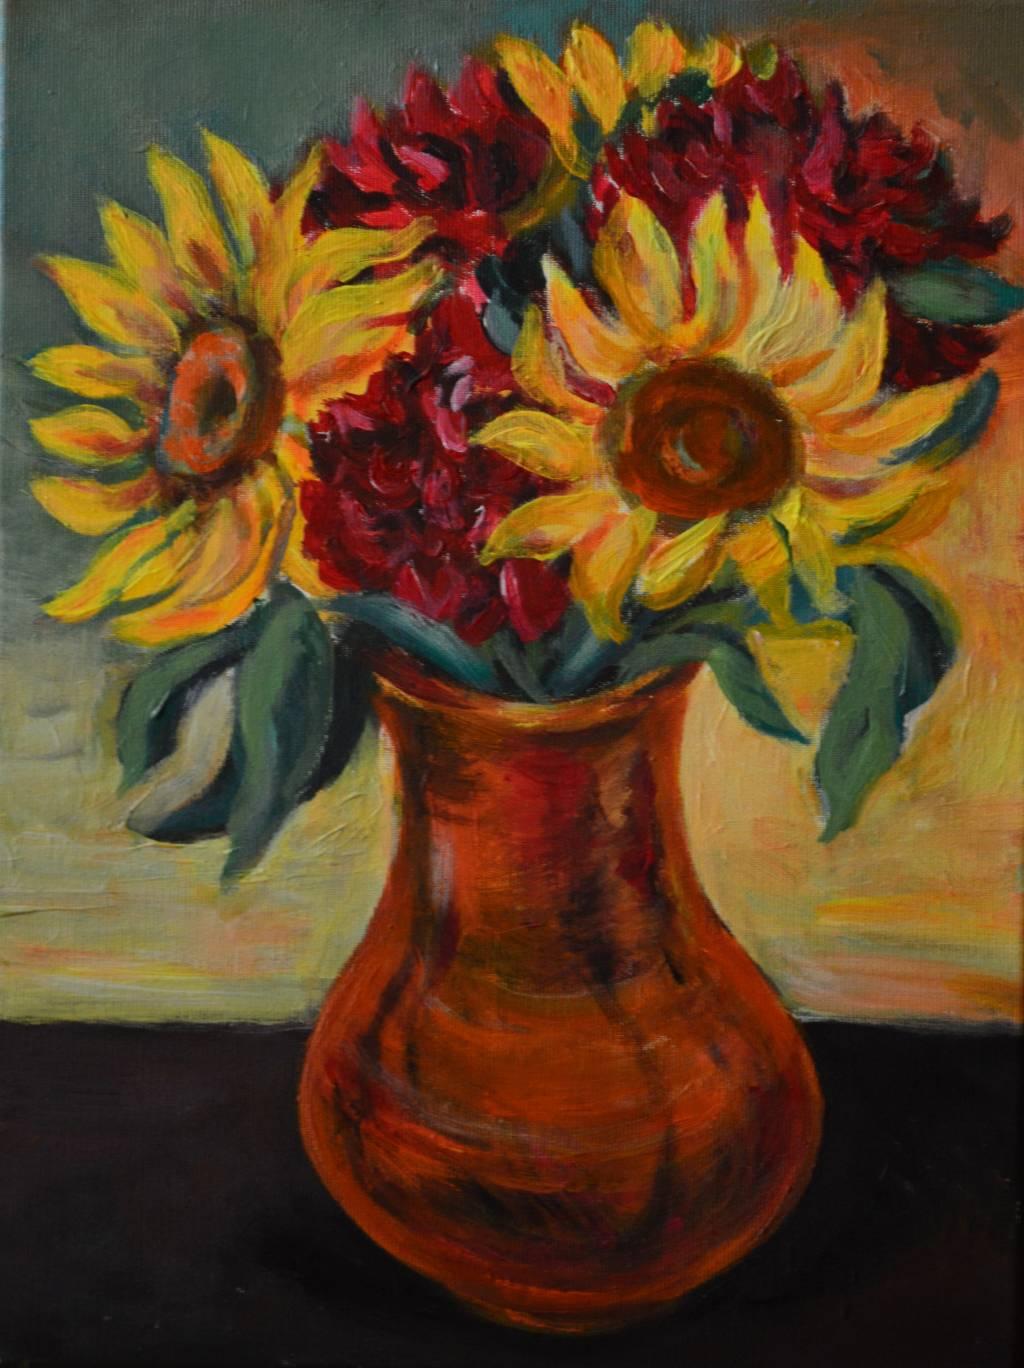 Poza Sunflower bouquet 3